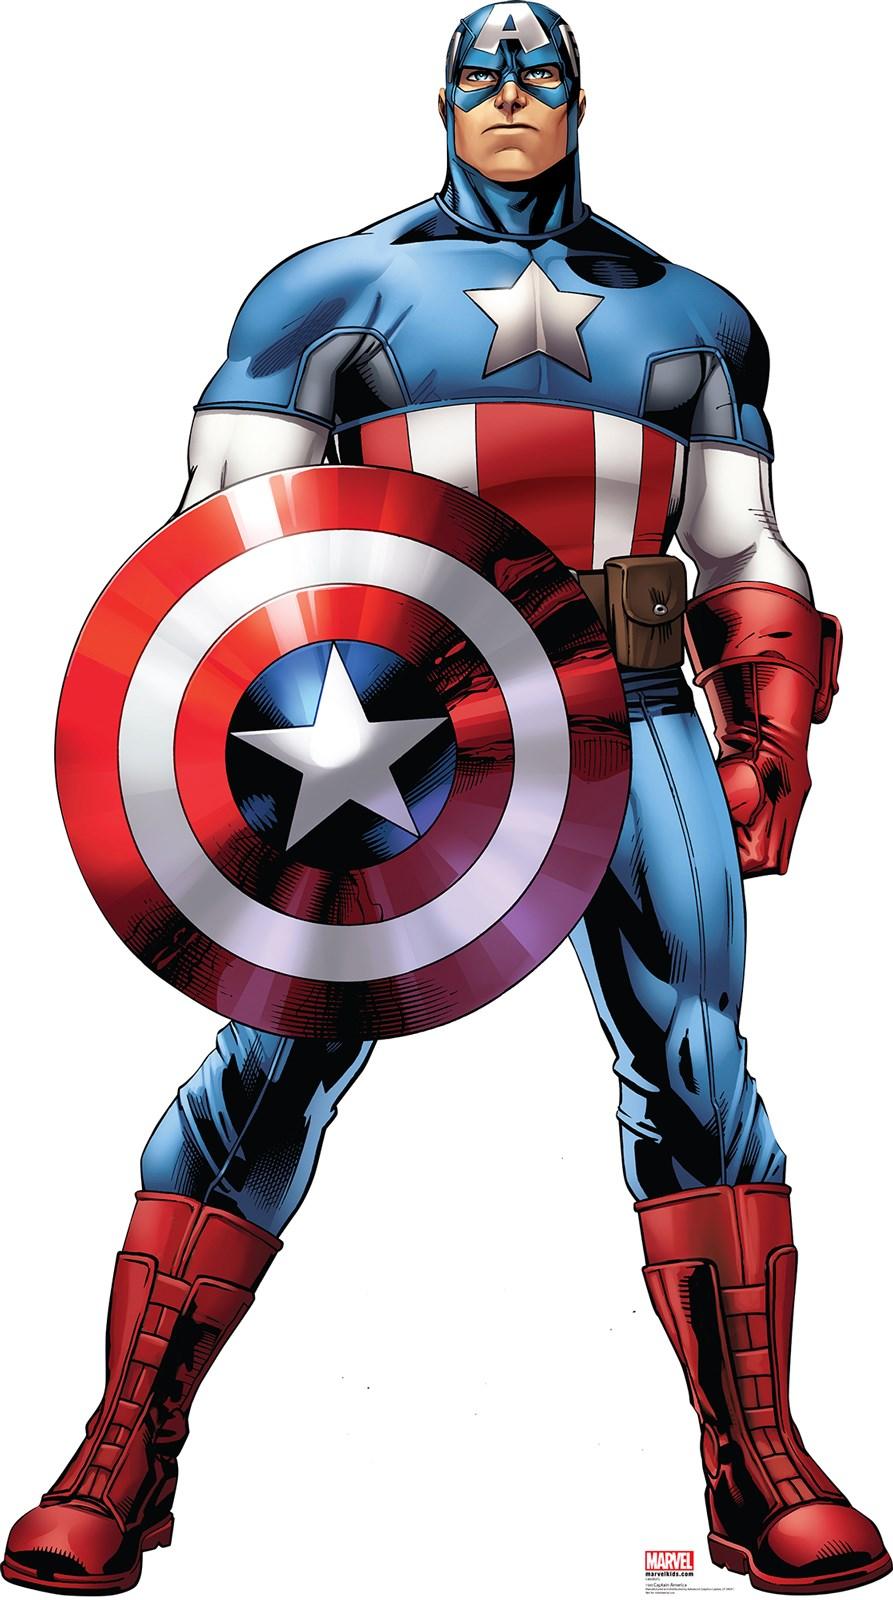 Captain america standup 6 39 tall - Image captain america ...